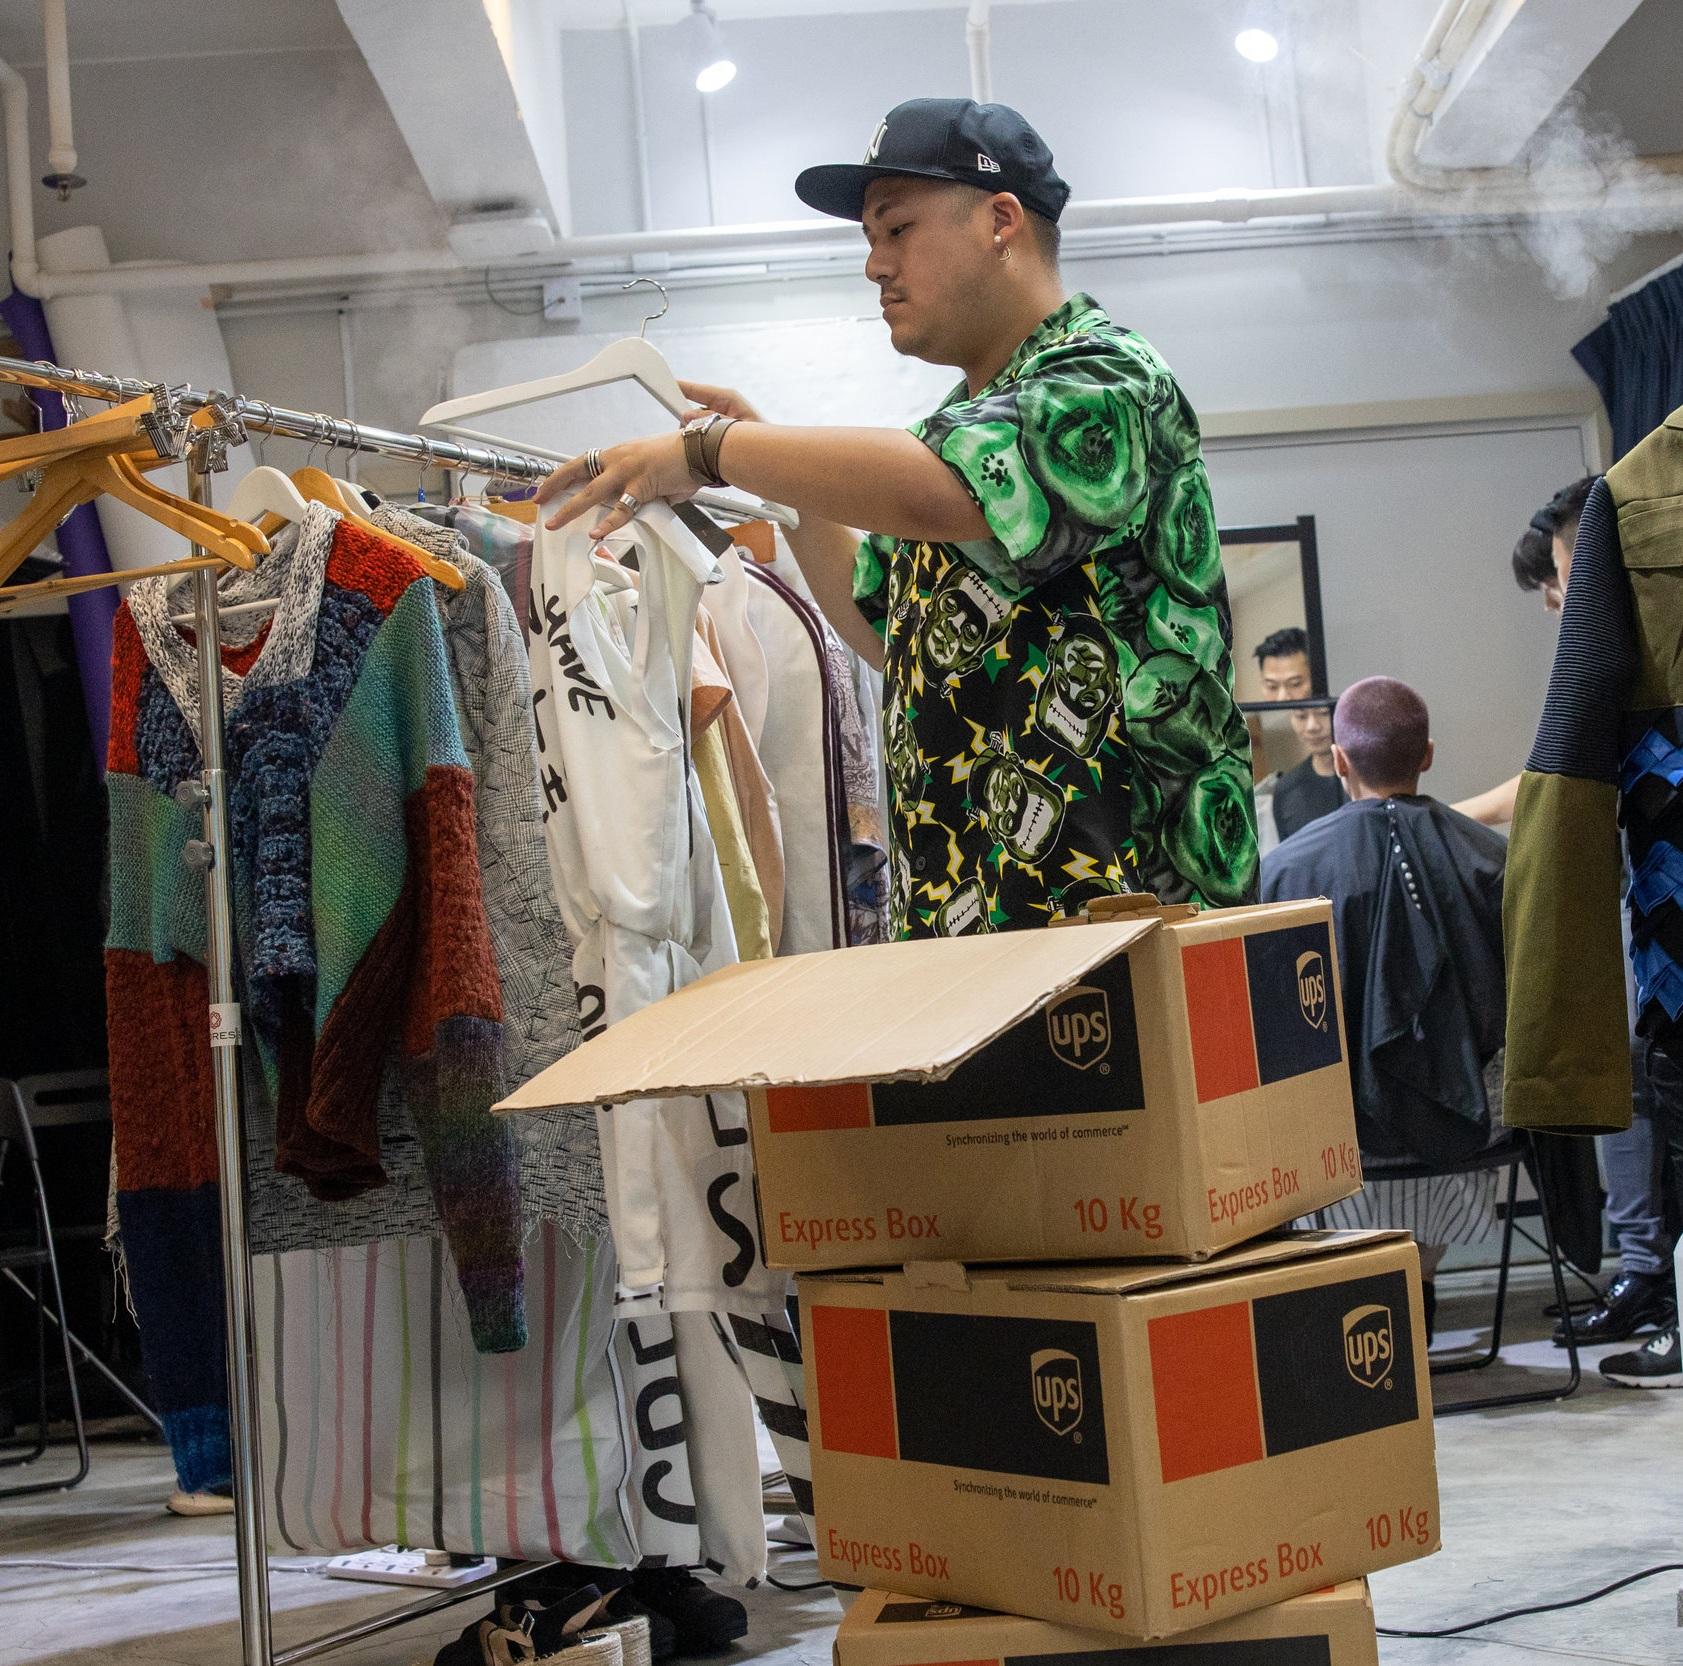 Stylist Kieran Ho arranging the garments for the photoshoot